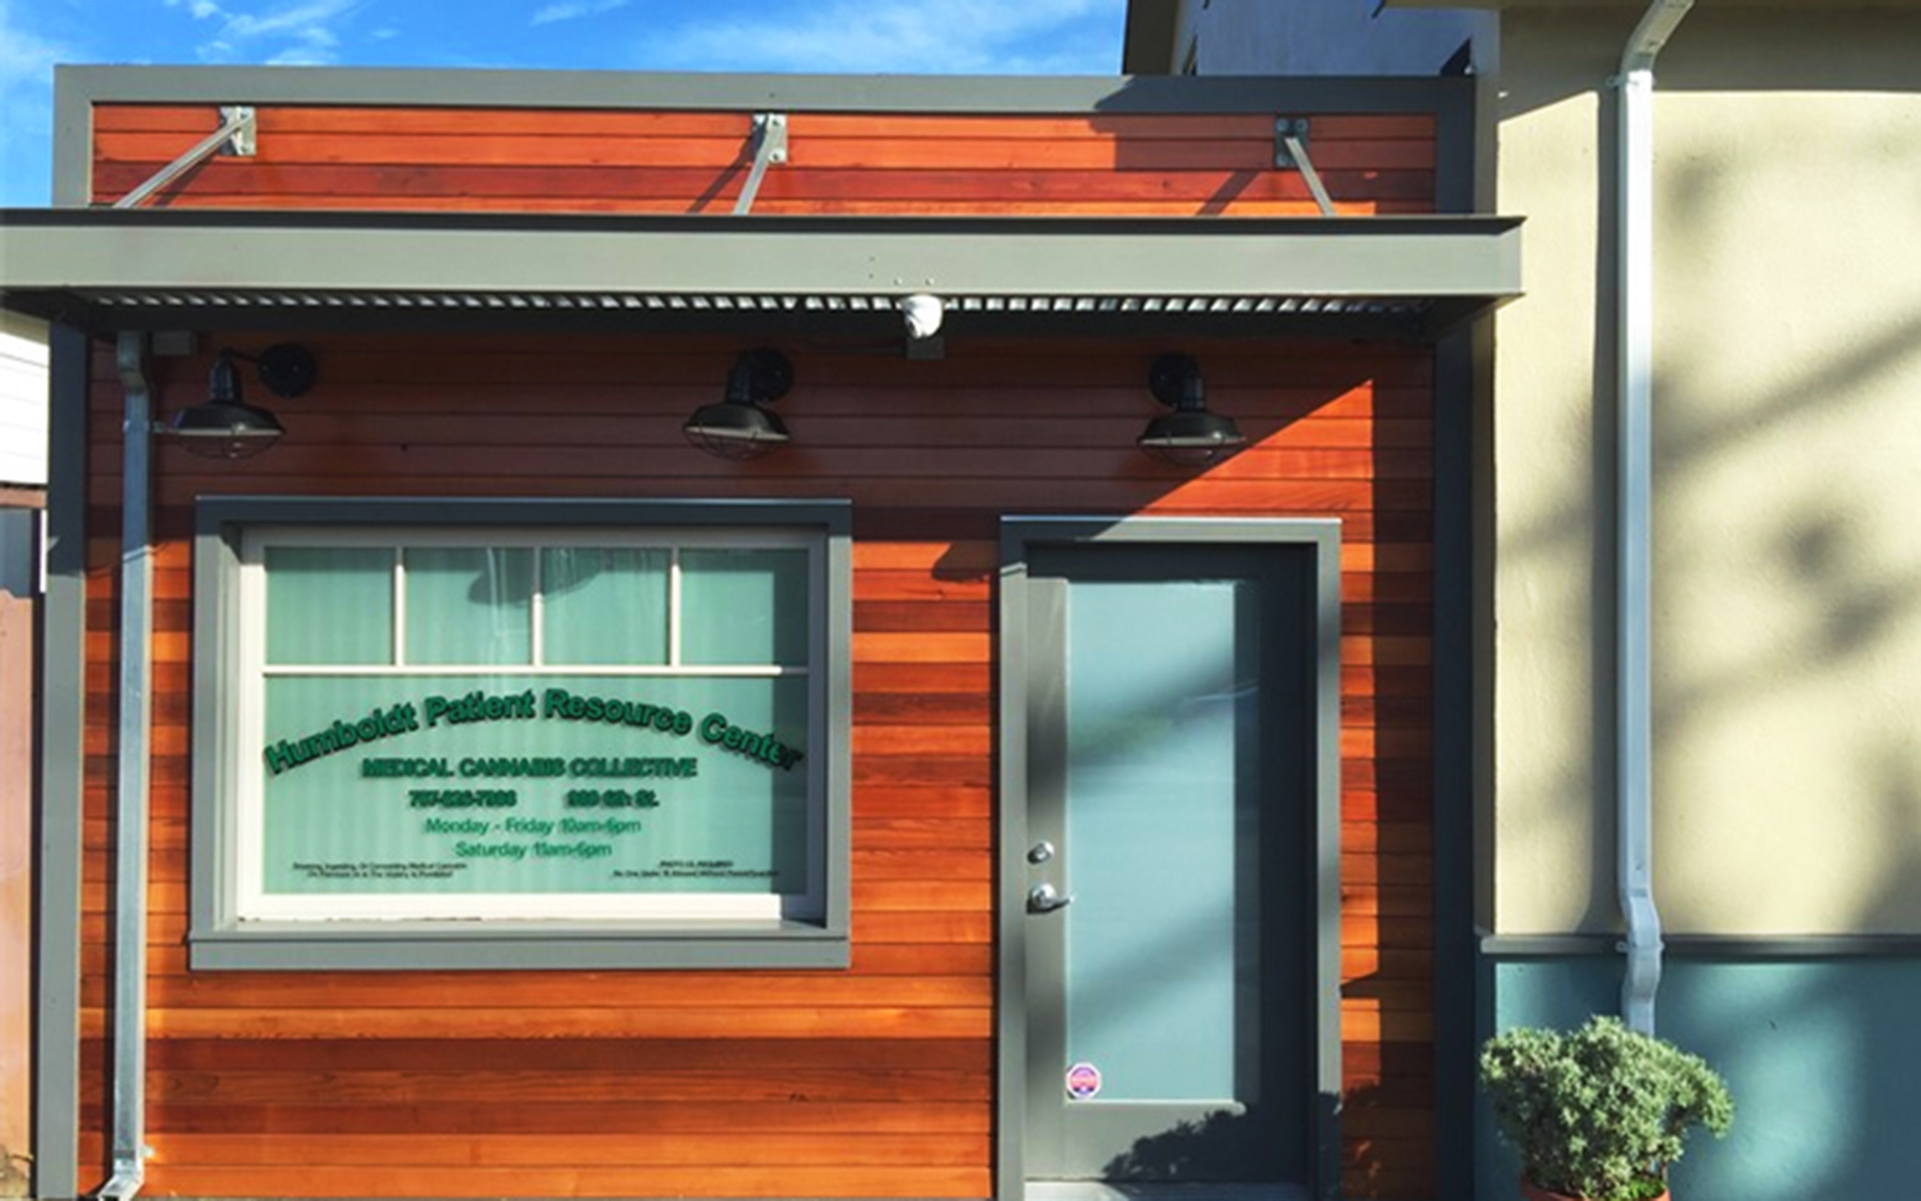 Humboldt Patient Resource Center medical marijuana dispensary in Arcata, California